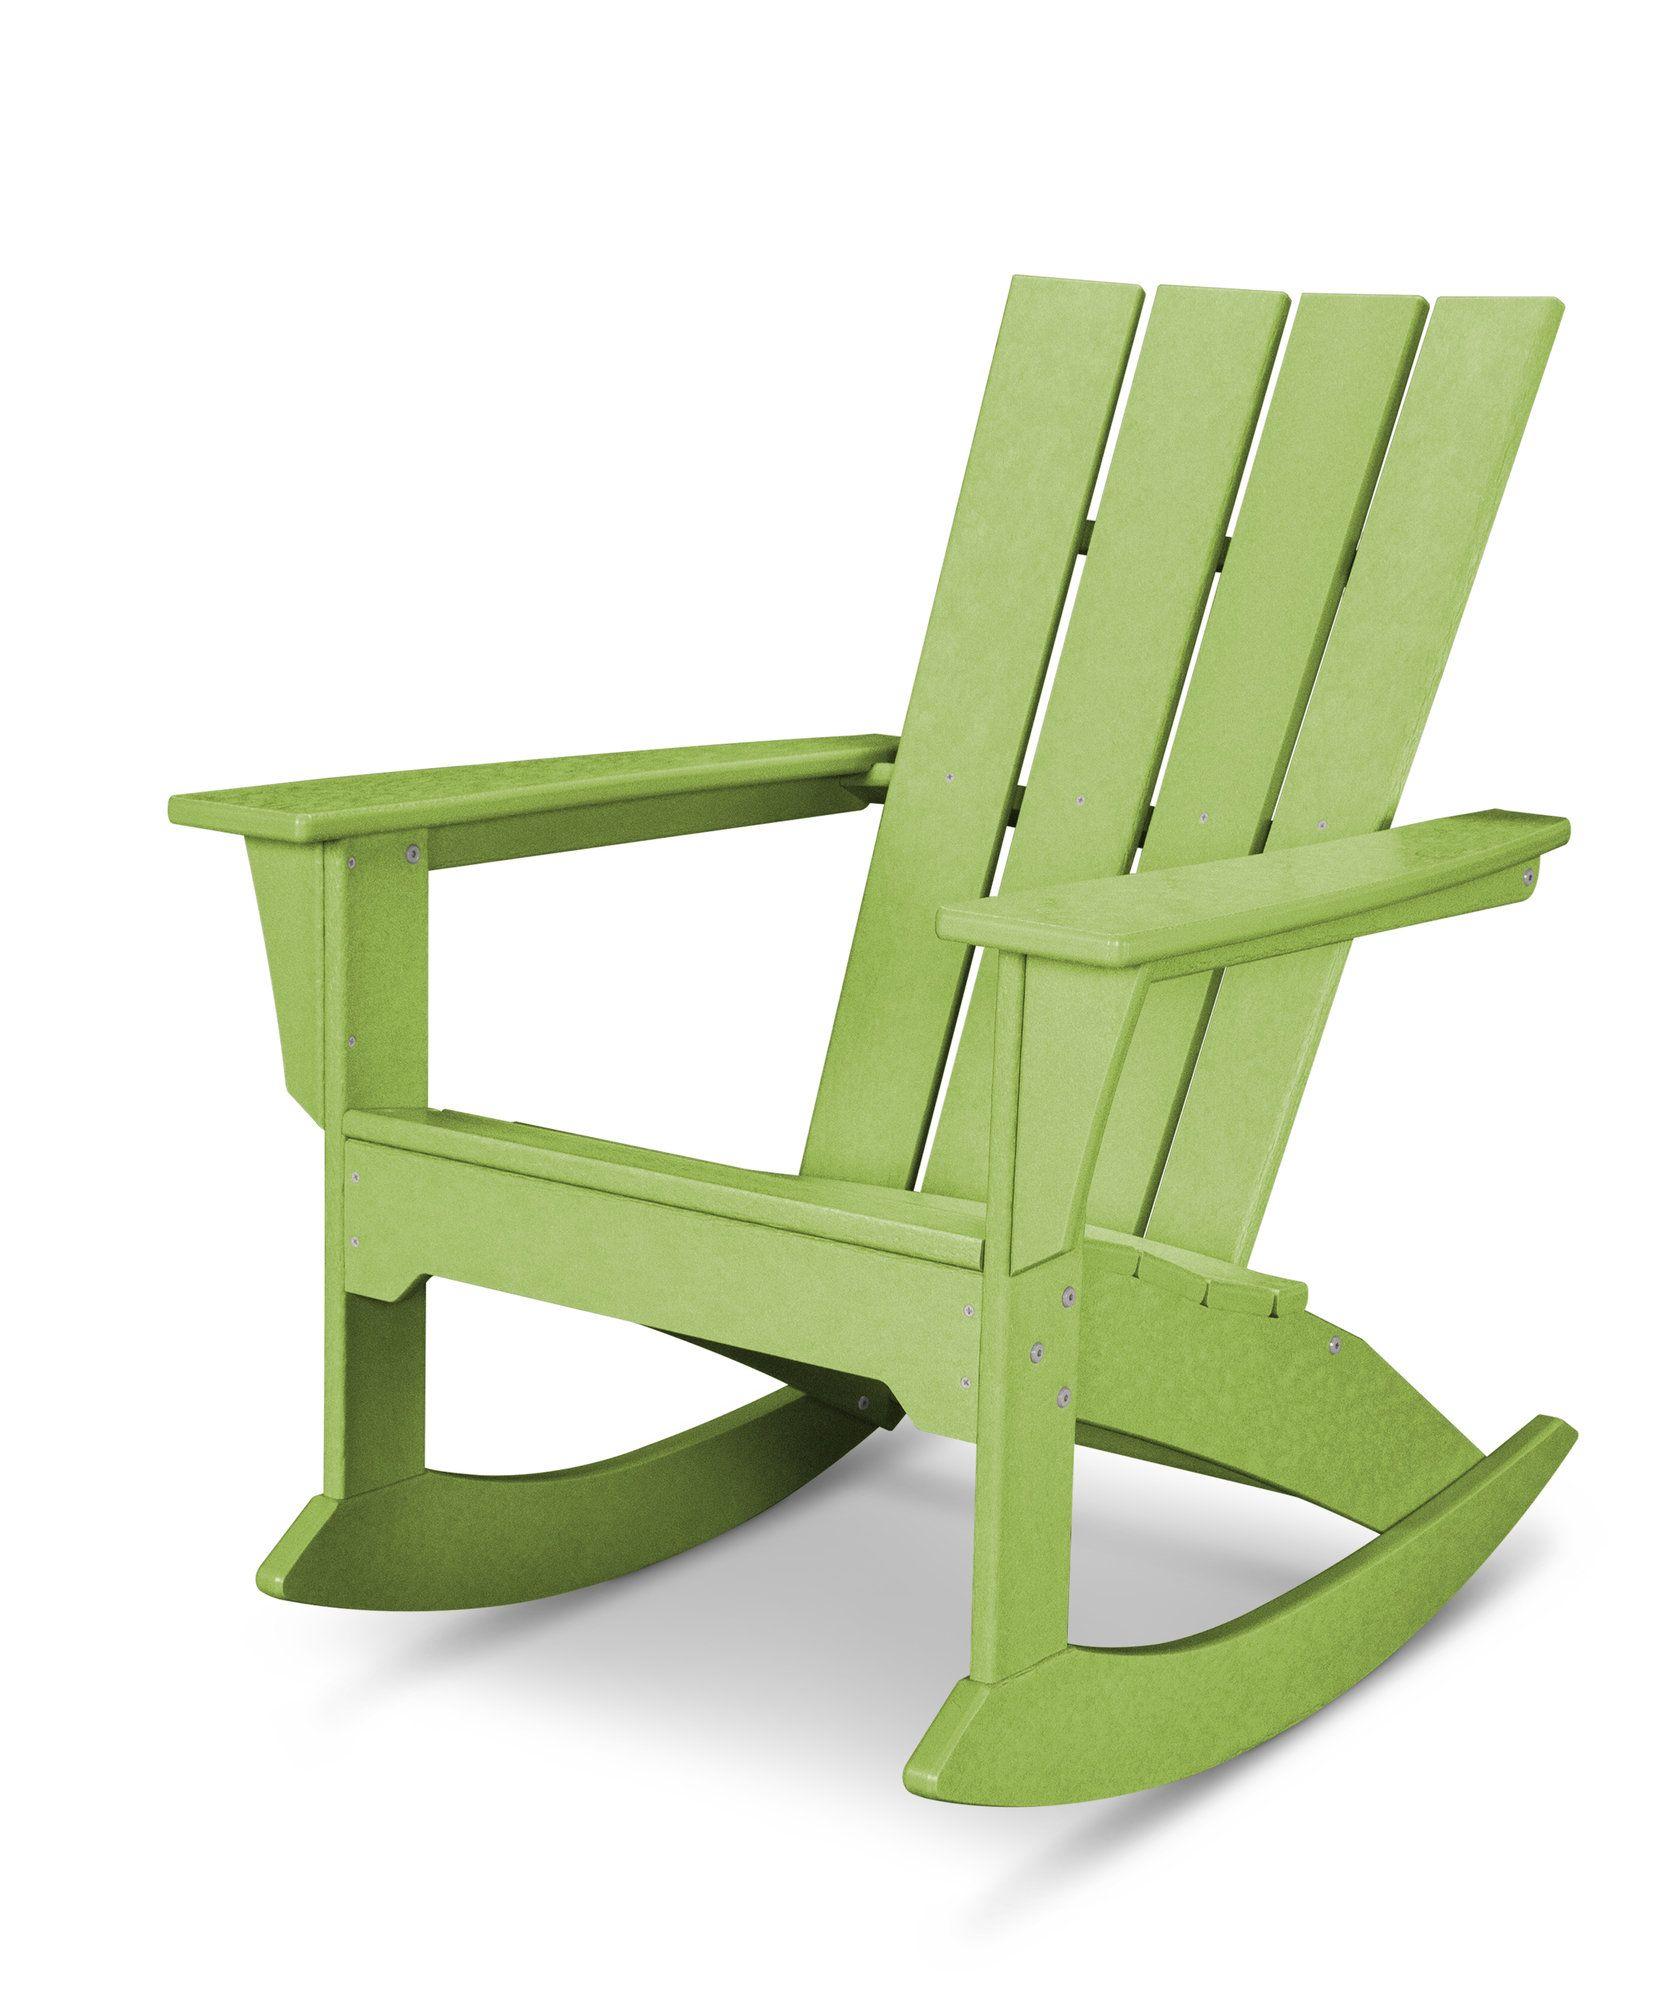 Quattro Plastic Resin Adirondack Chair Rocking Chair Plastic